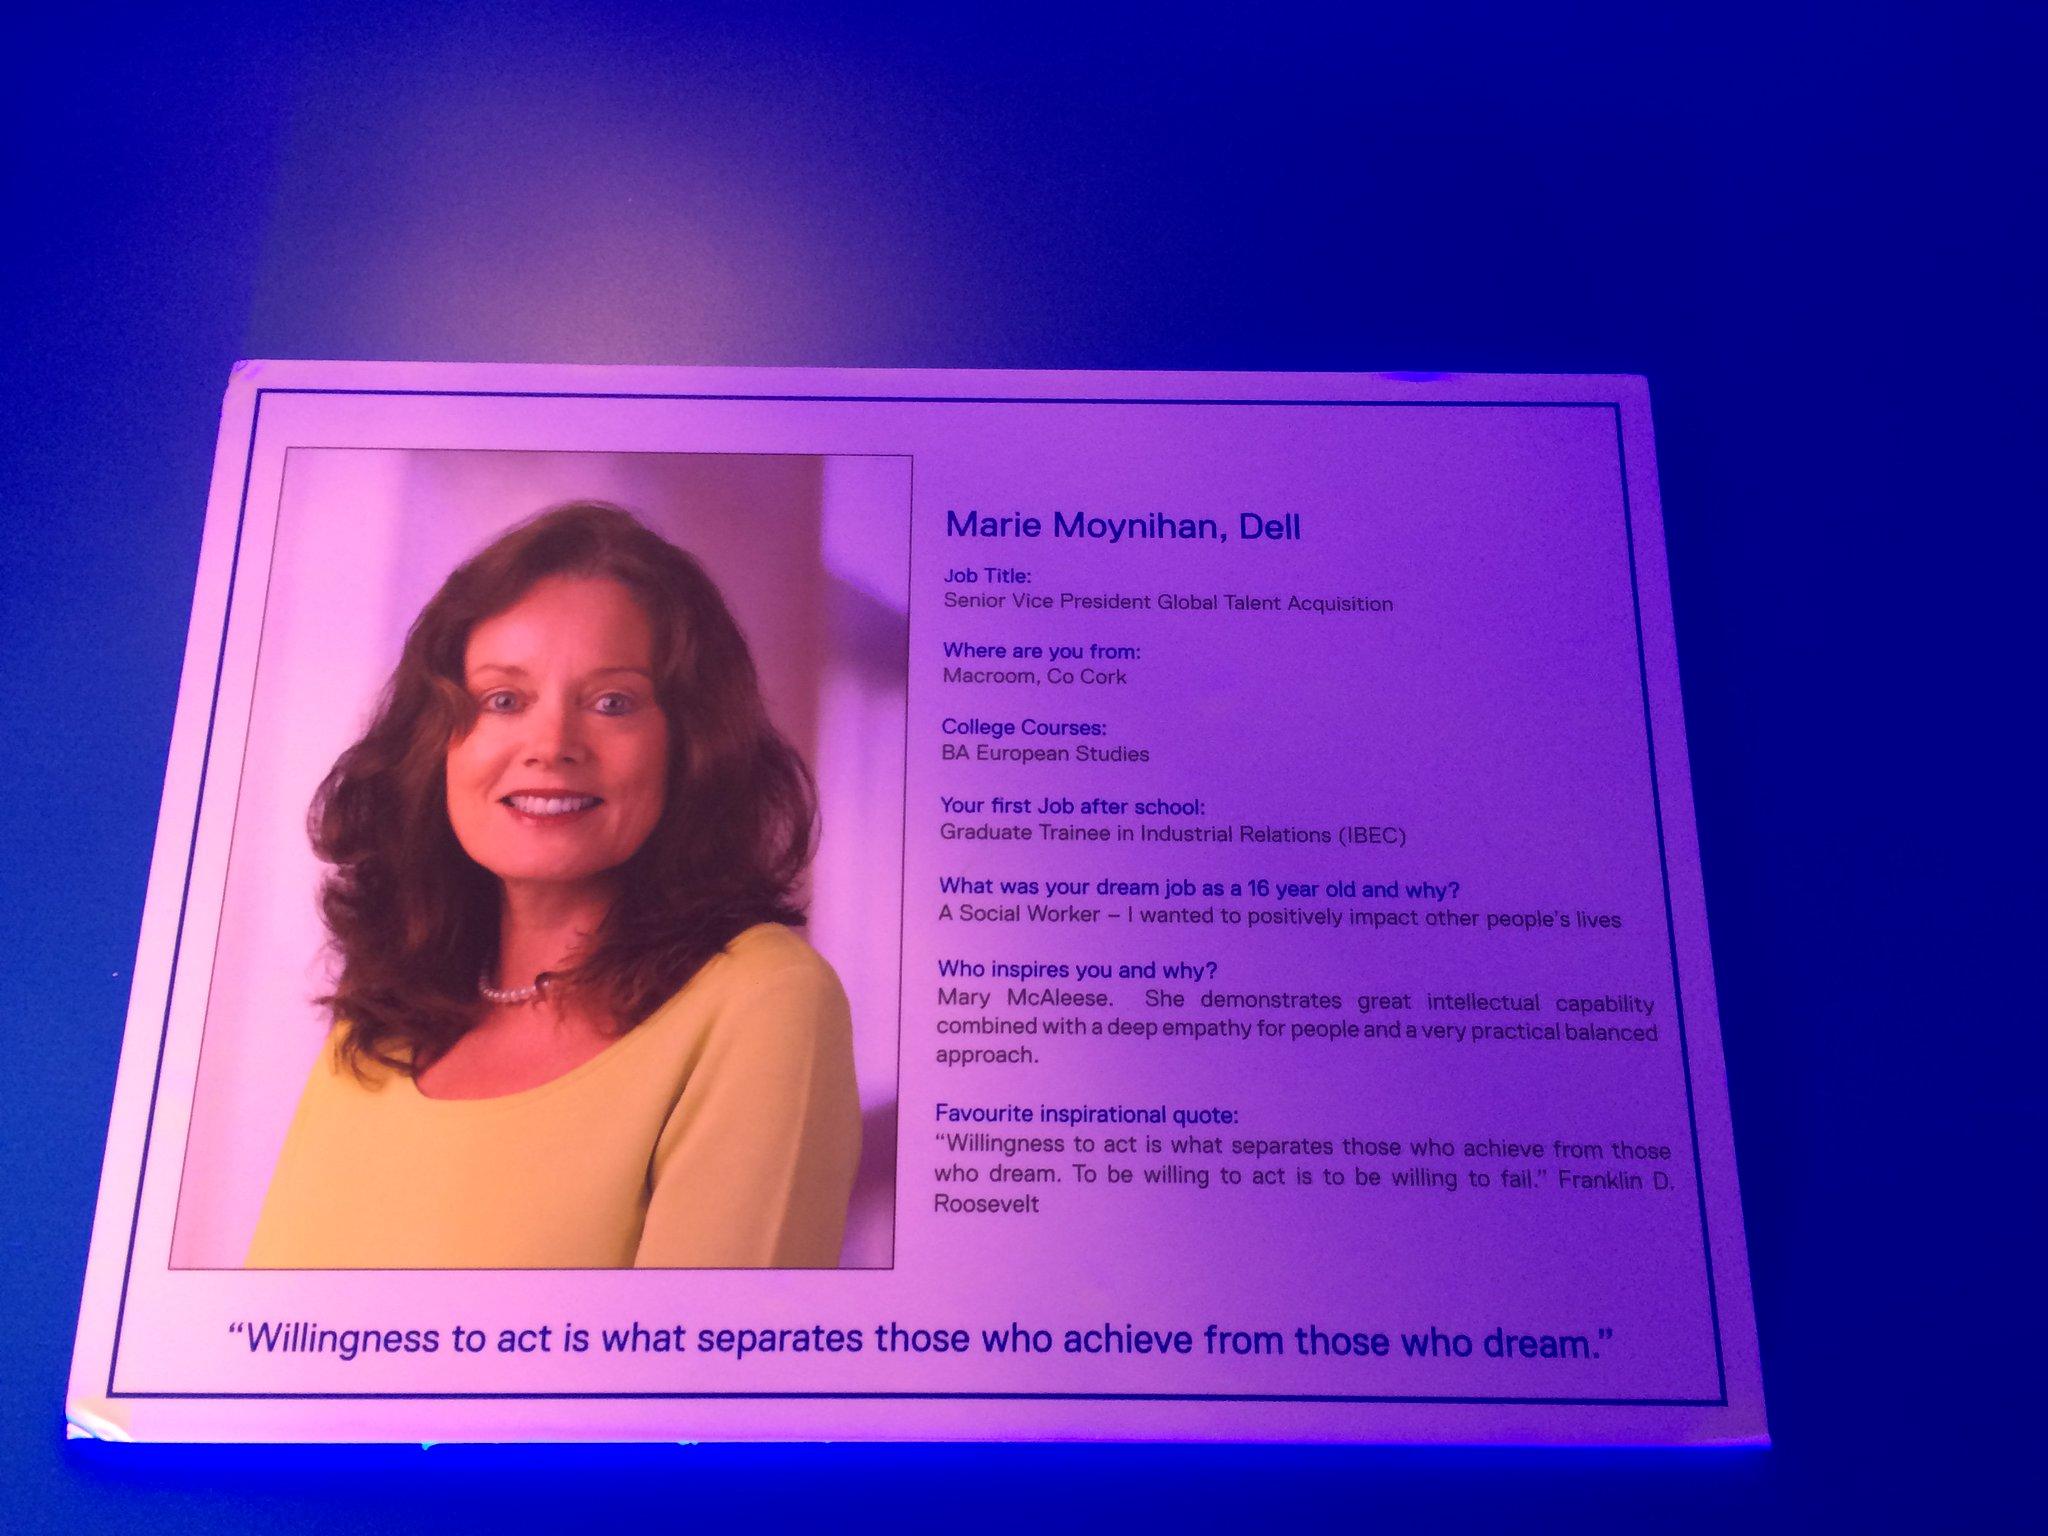 Lisa Fitzsimons On Twitter Inspiring Careers In Tech At City Hall Cork Our Global Ta Lead Mariematdell Dellemcuki Considerstem Iwish17